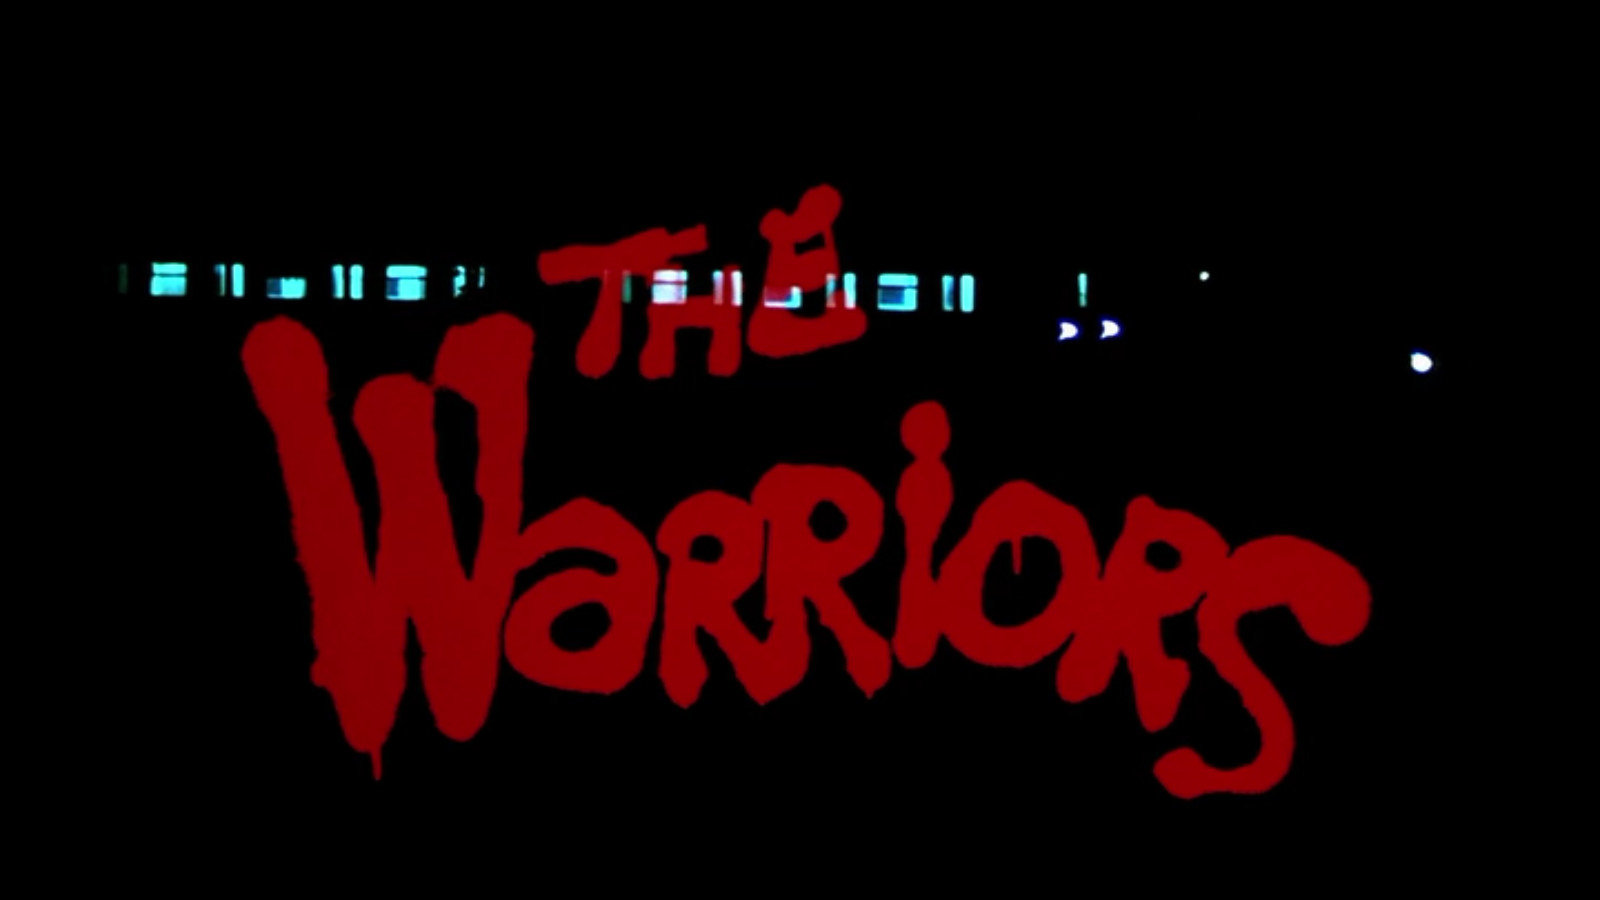 the warriors wallpapers hd for desktop backgrounds